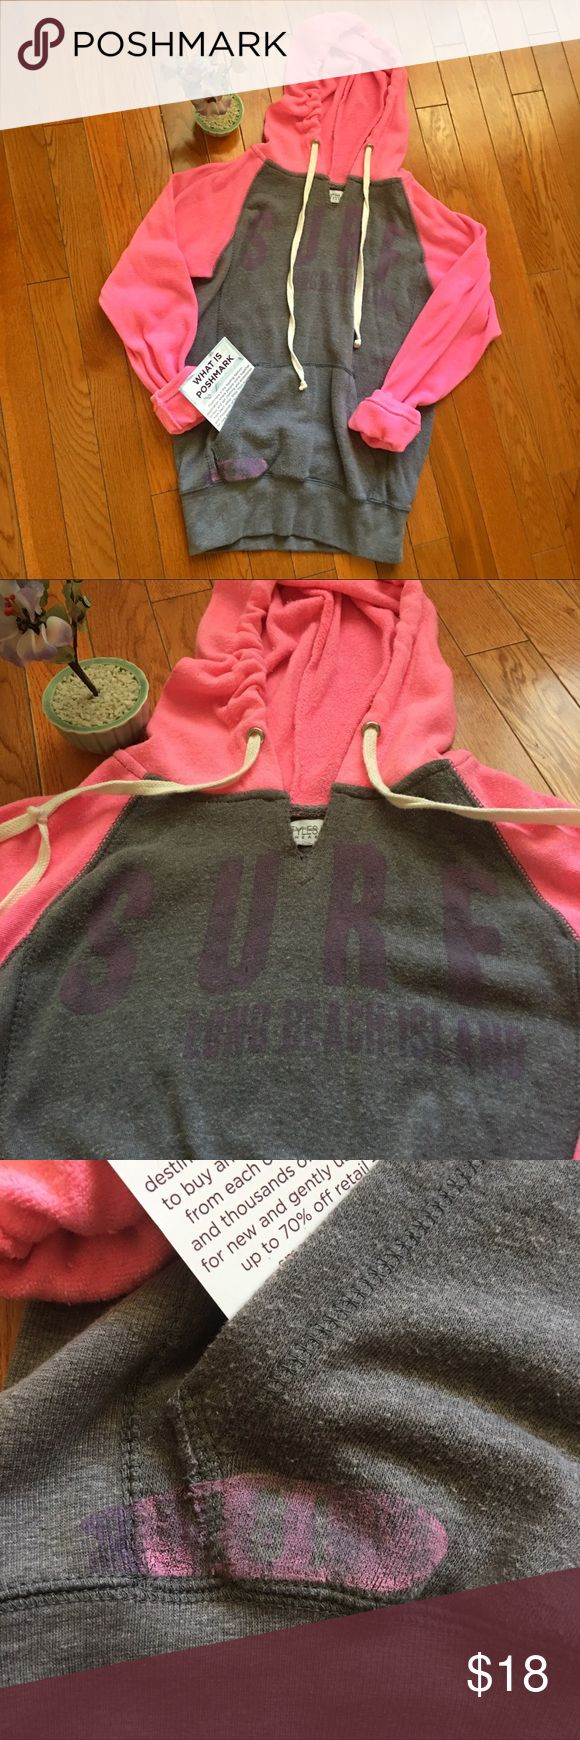 Surf hoodie From Long Island beach. A bit faded Tops Sweatshirts & Hoodies